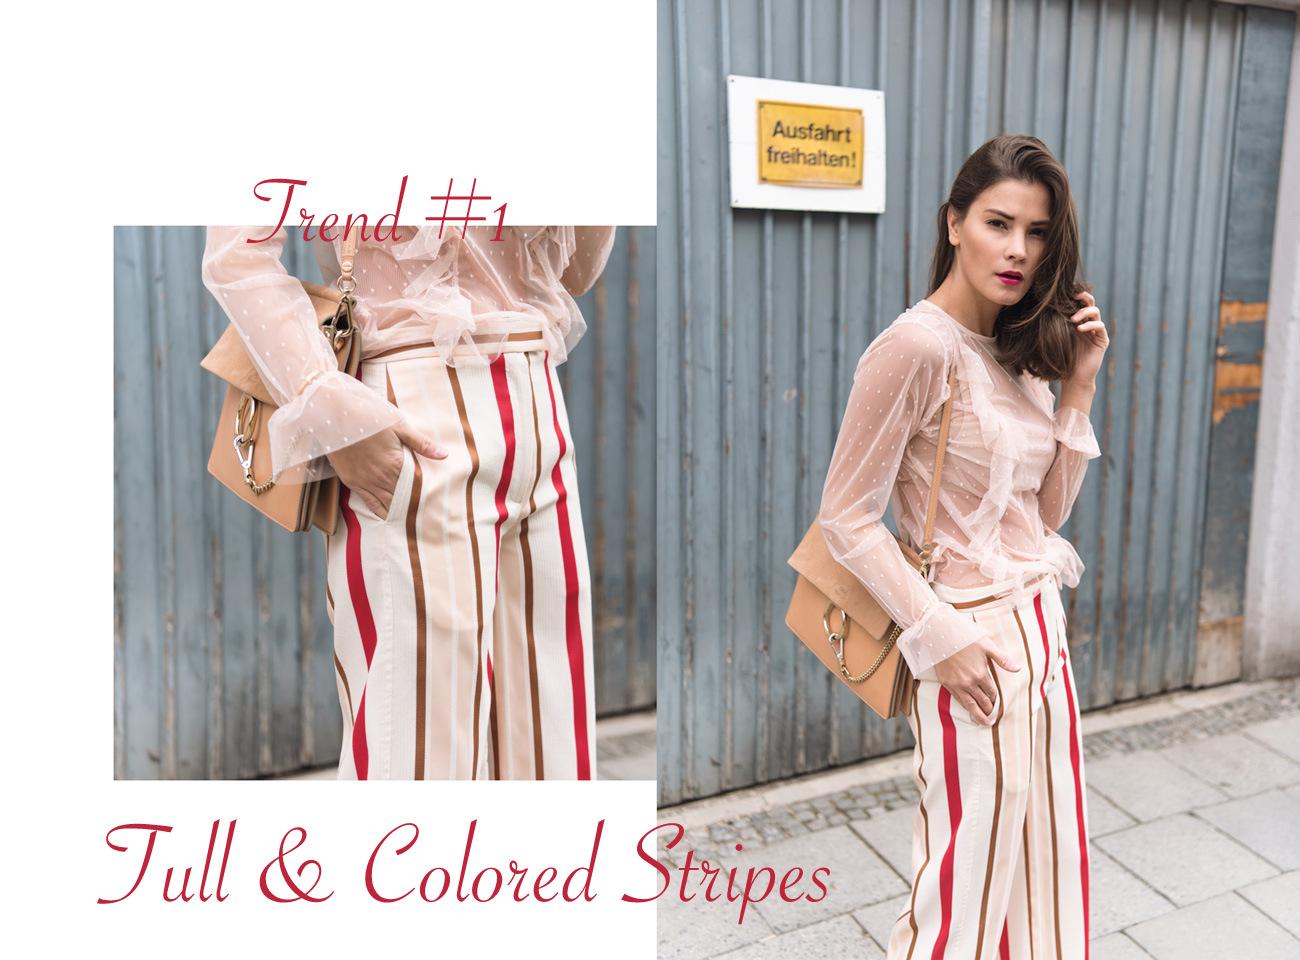 bunte-streifen-trend-2017-culotte-paul&joe-sister-colored-stripes-blogger-style-fashiioncarpet